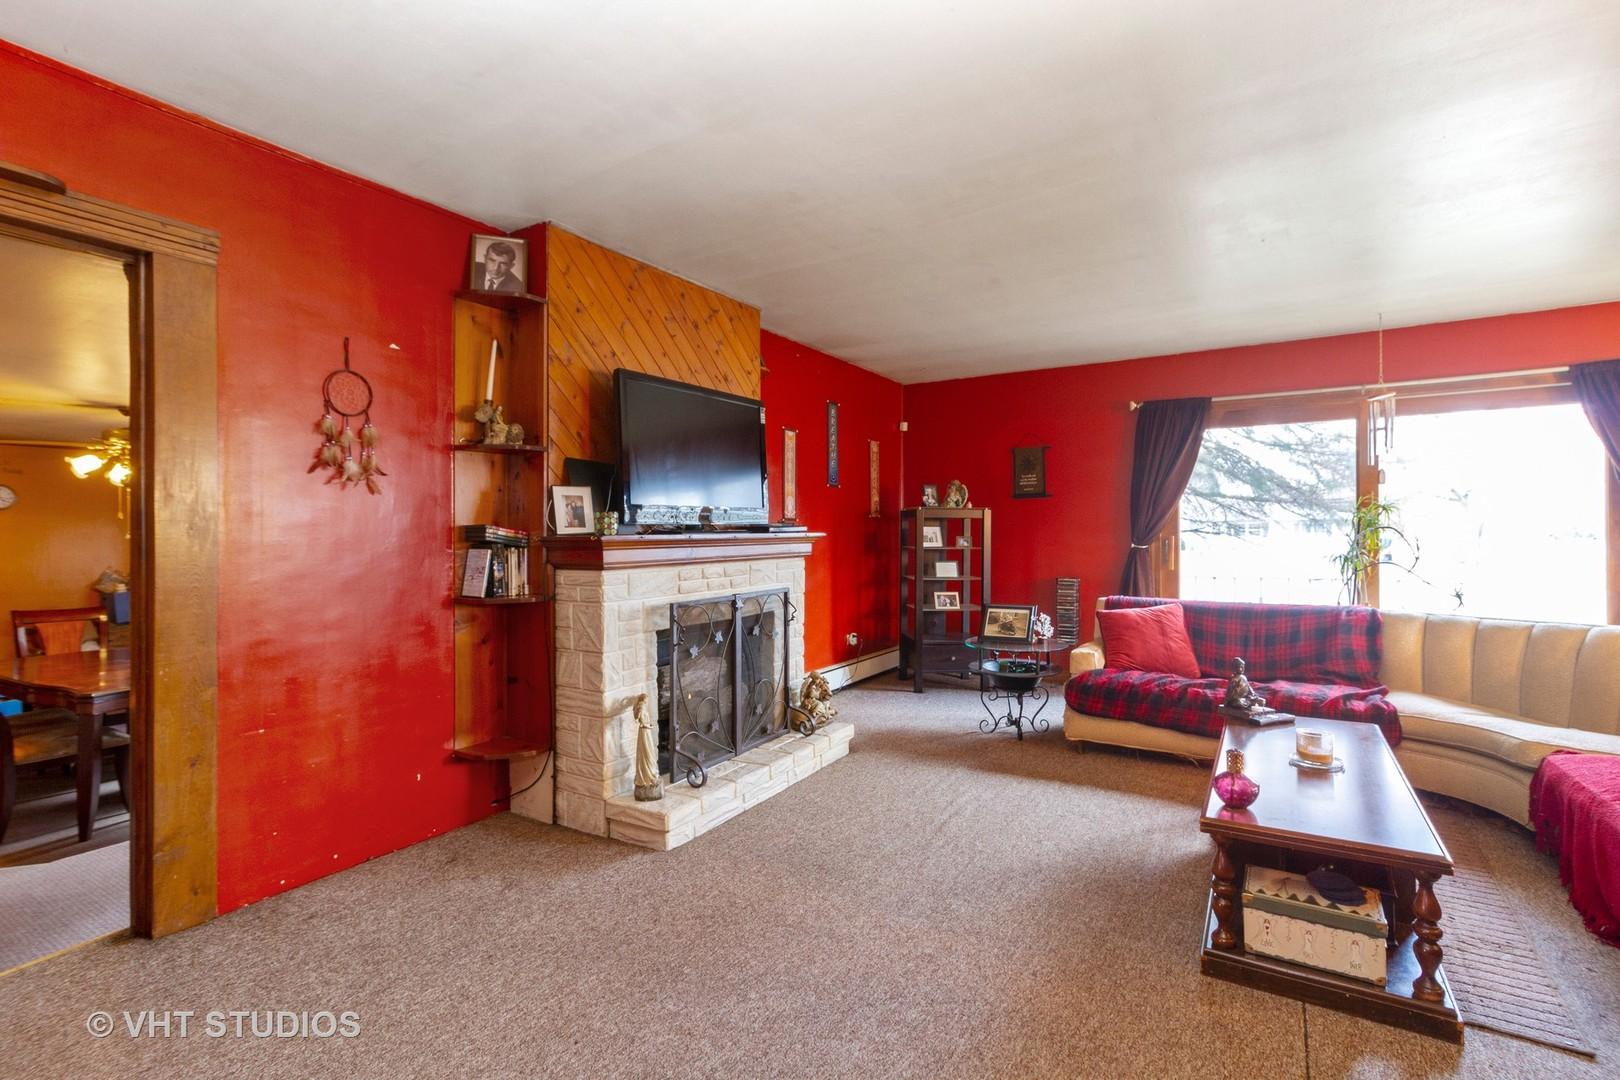 6601 West 115th, Worth, Illinois, 60482